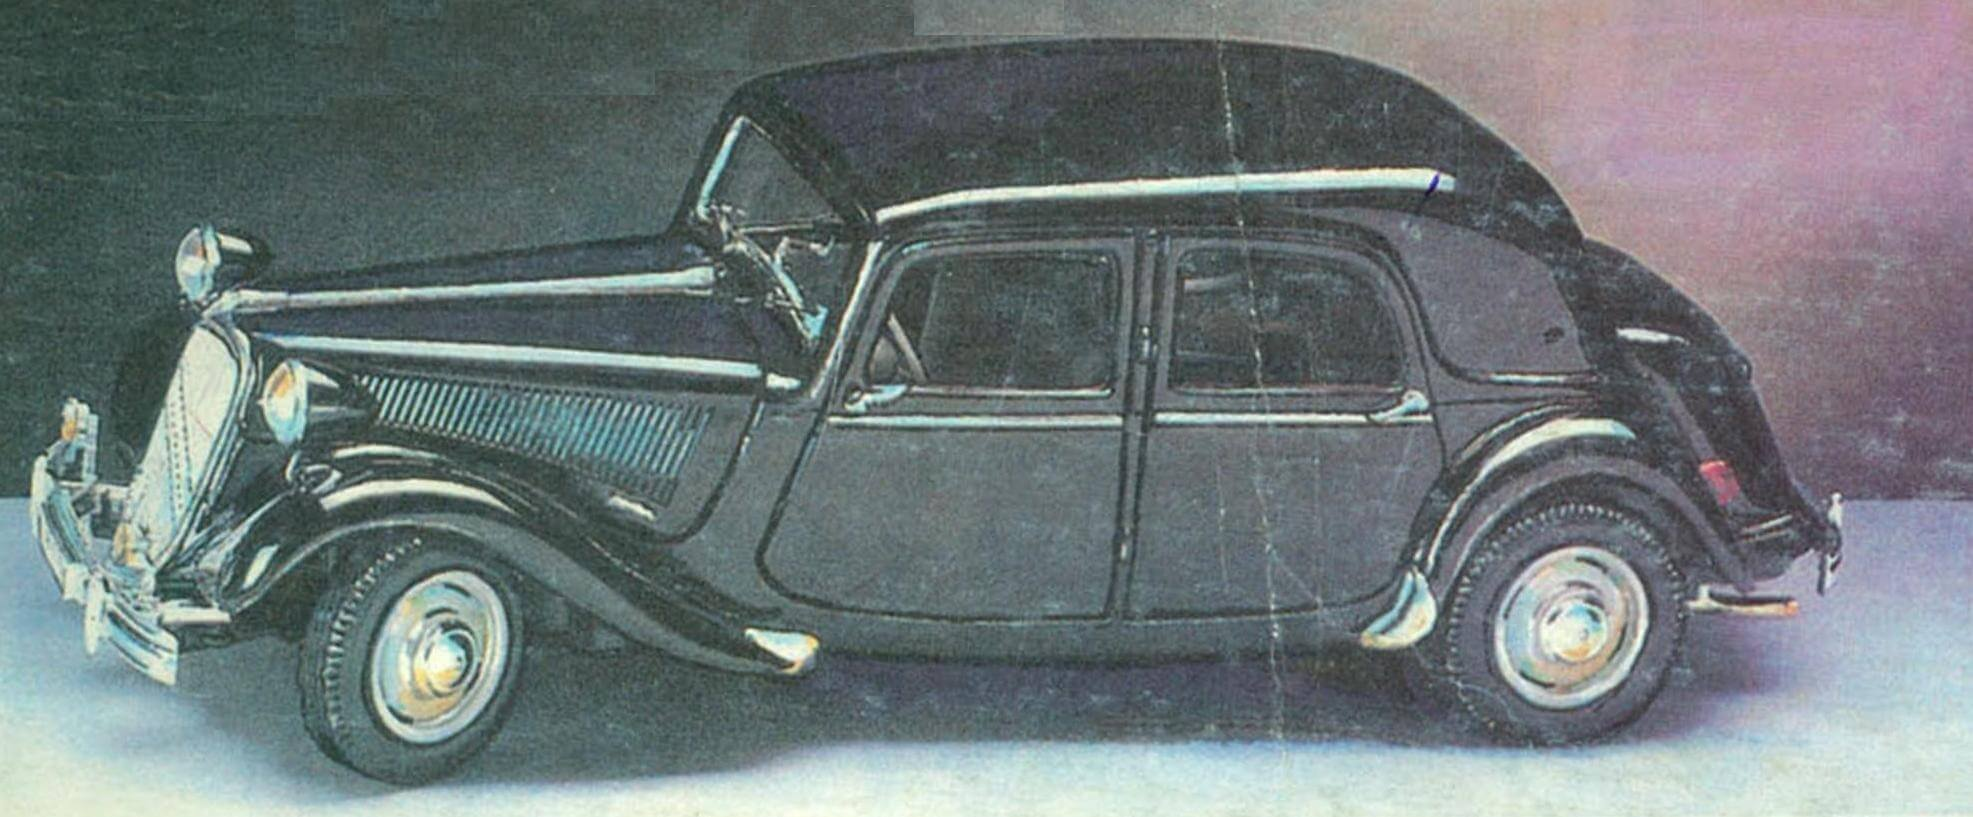 CITROEN 15CV 6 Cyl (1952)